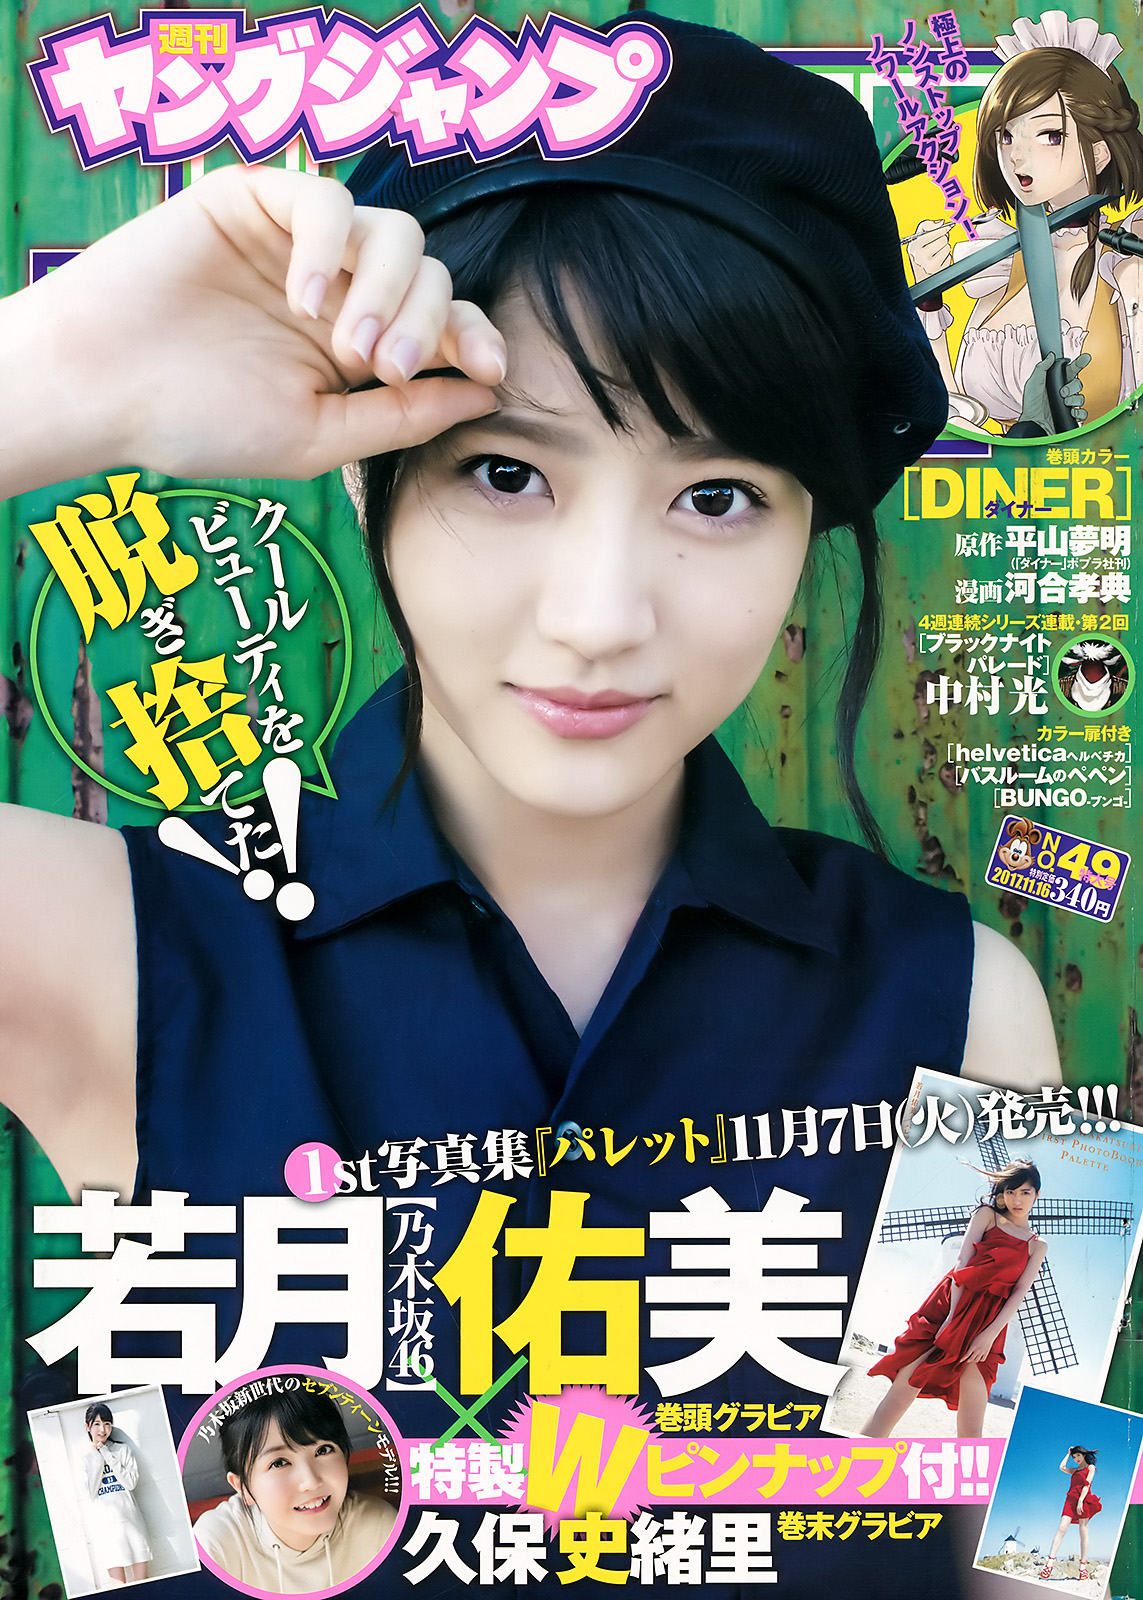 Wakatsuki Yumi 若月佑美, Young Jump 2017 No.49 (週刊ヤングジャンプ 2017年49号)